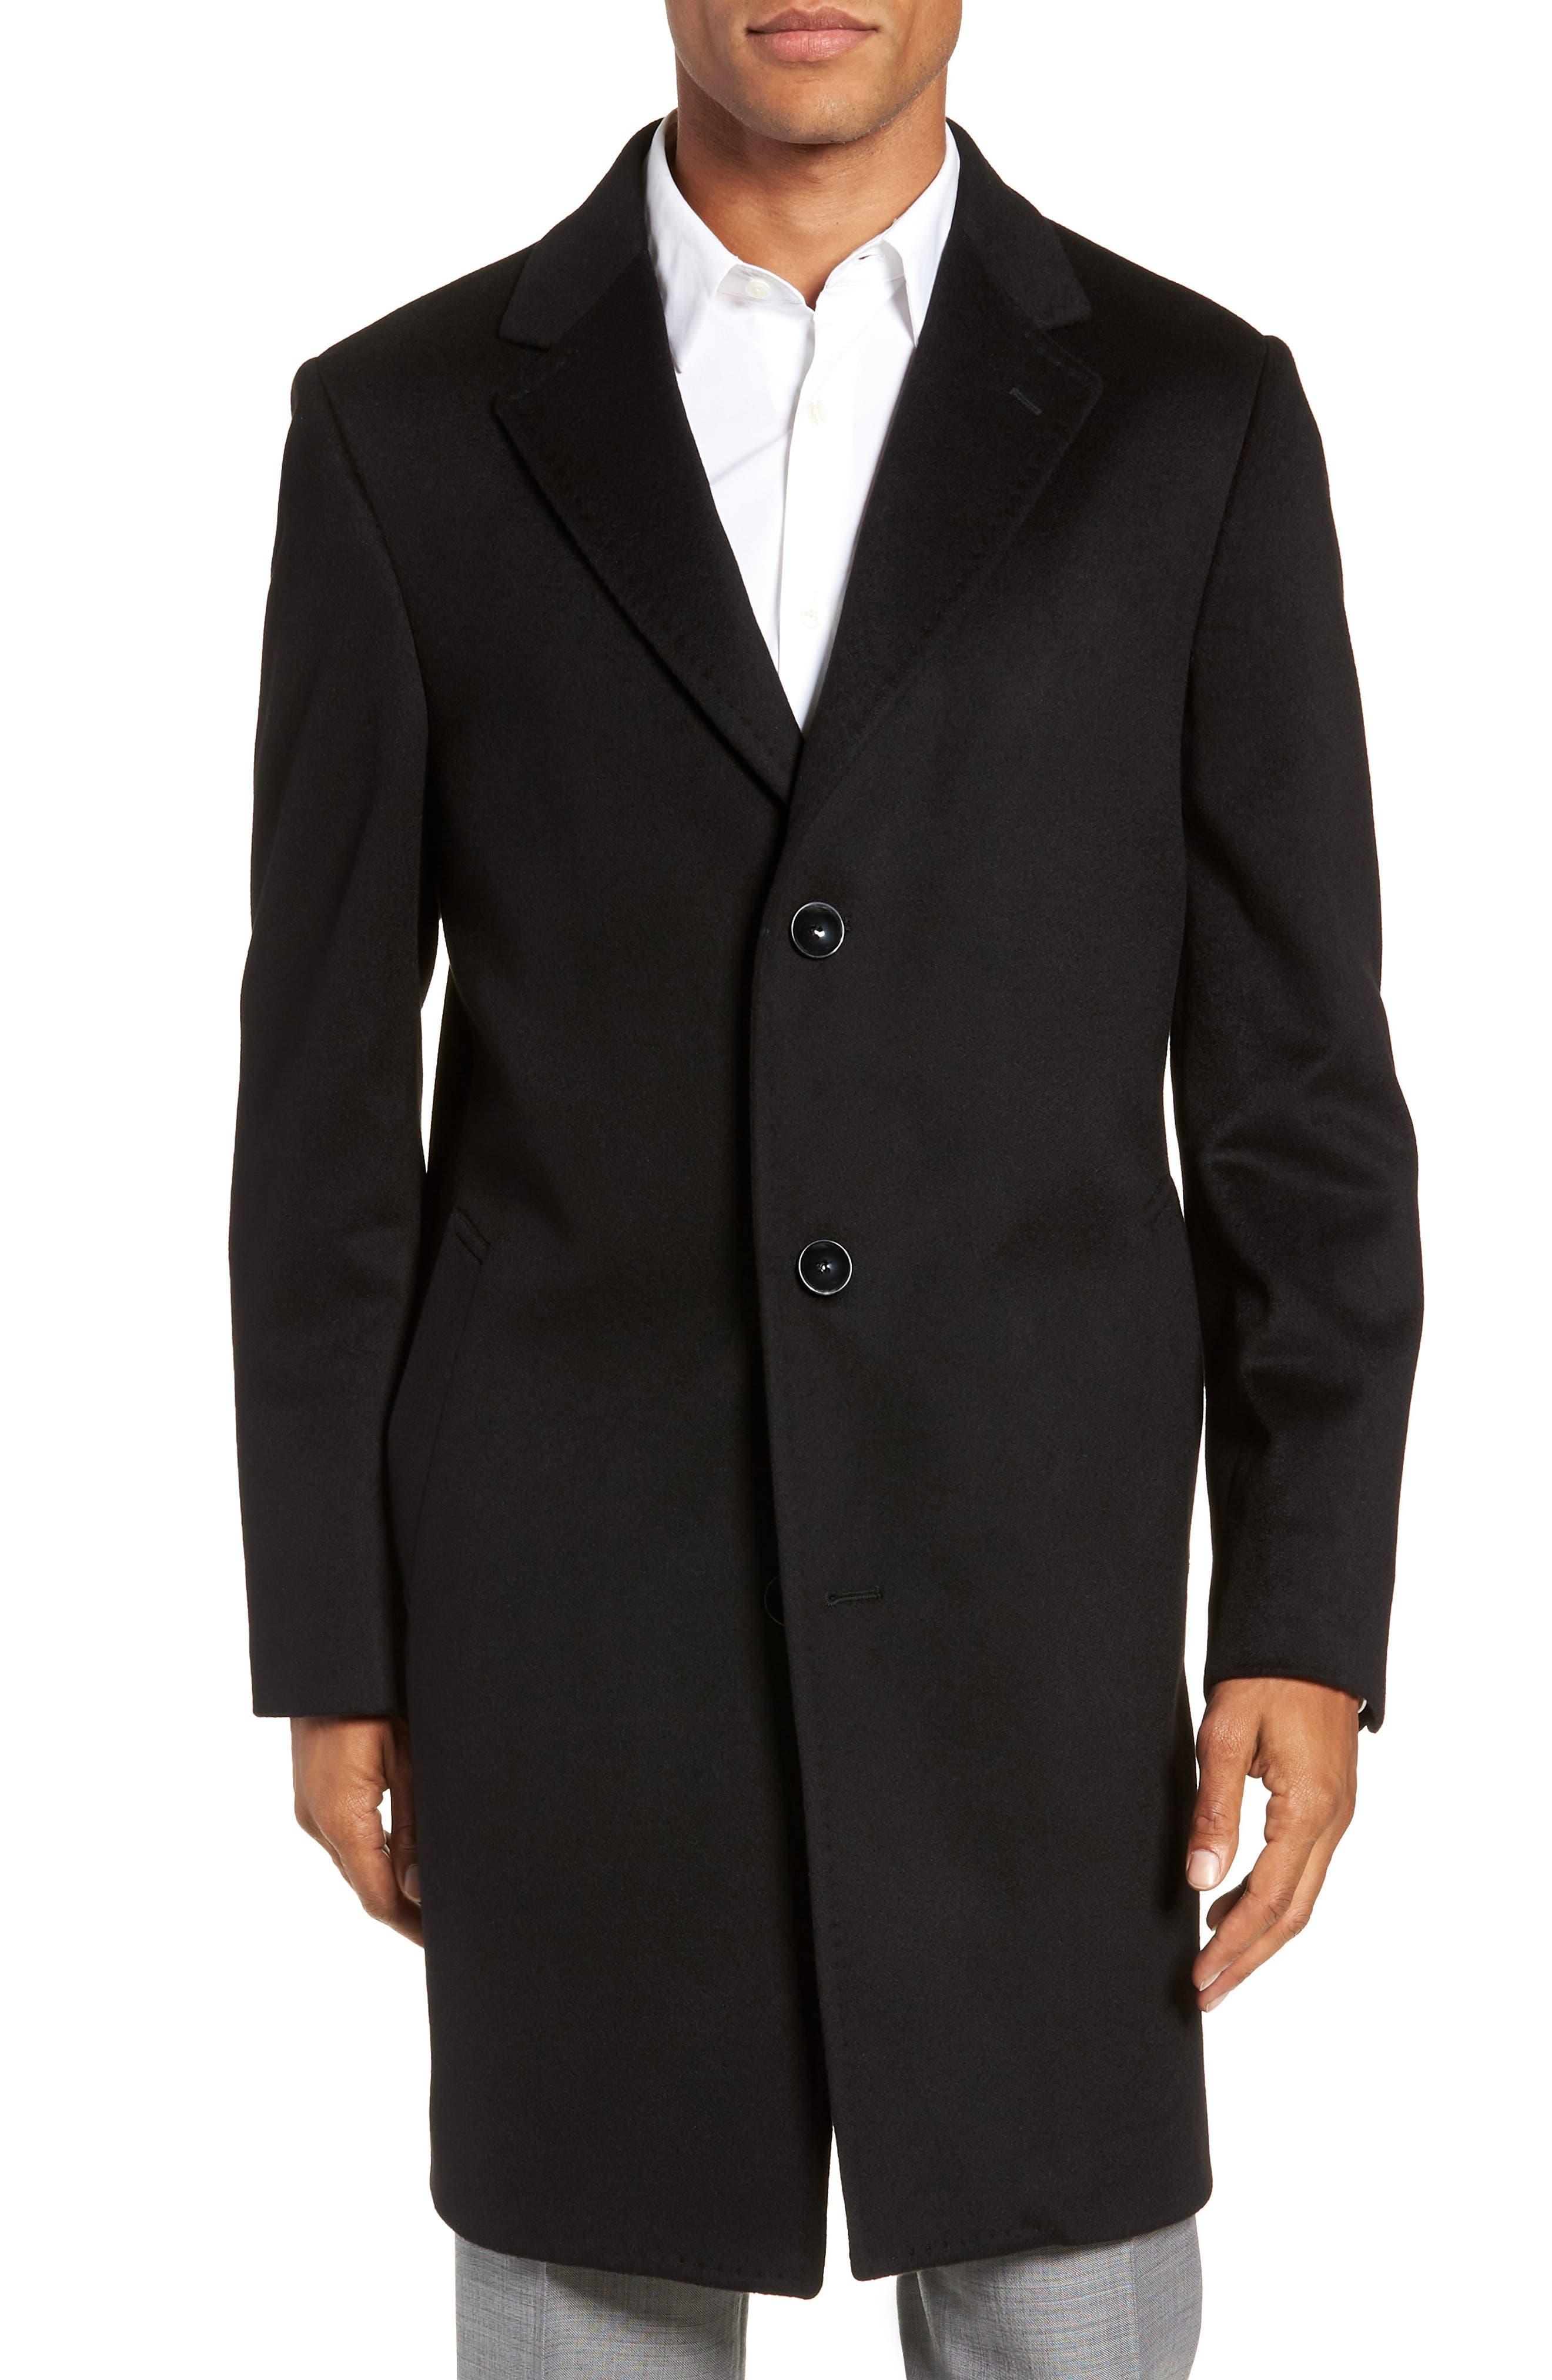 Darien Solid Cashmere Overcoat,                         Main,                         color, BLACK